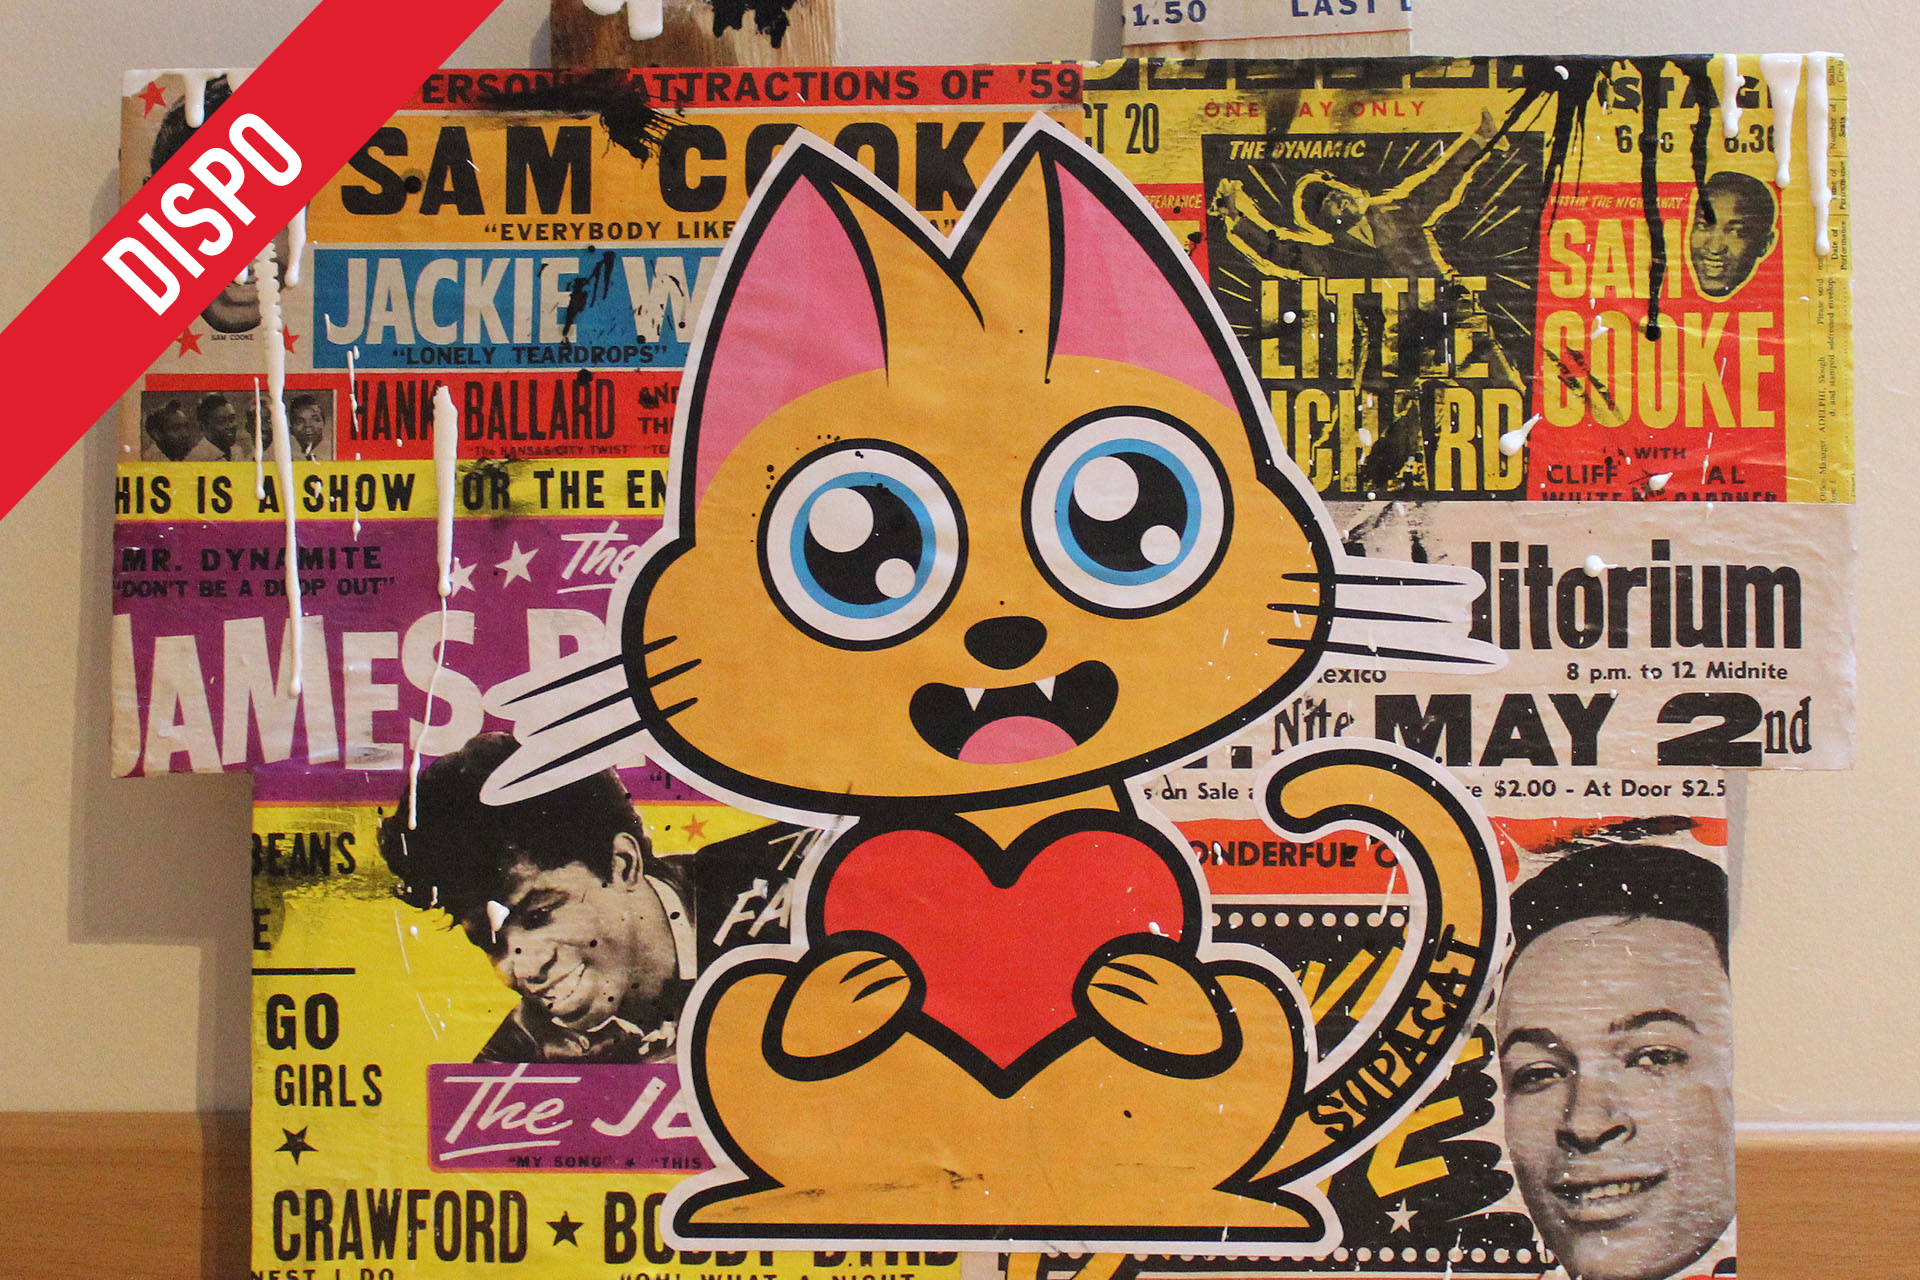 Supacat Street Art Strasbourg - The Love Cat feat. James, Marvin & Sam